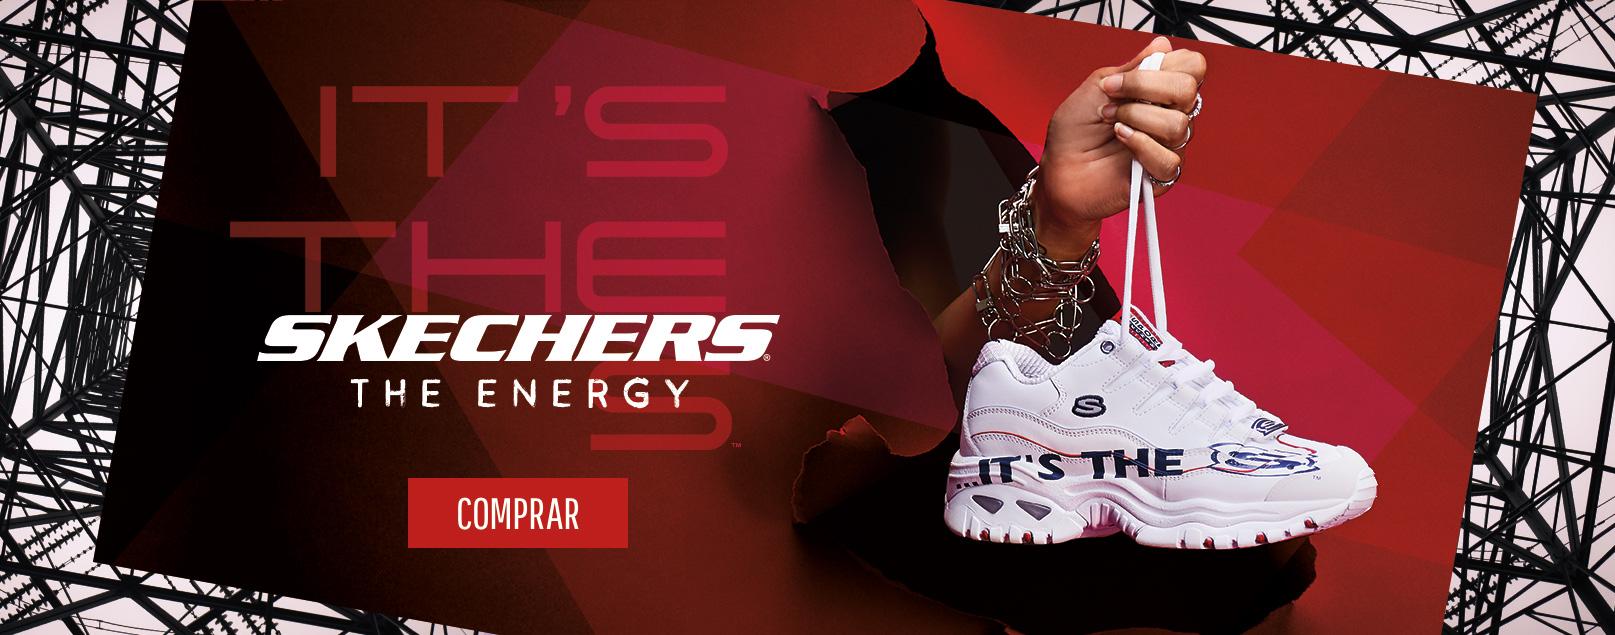 Skechers Energy